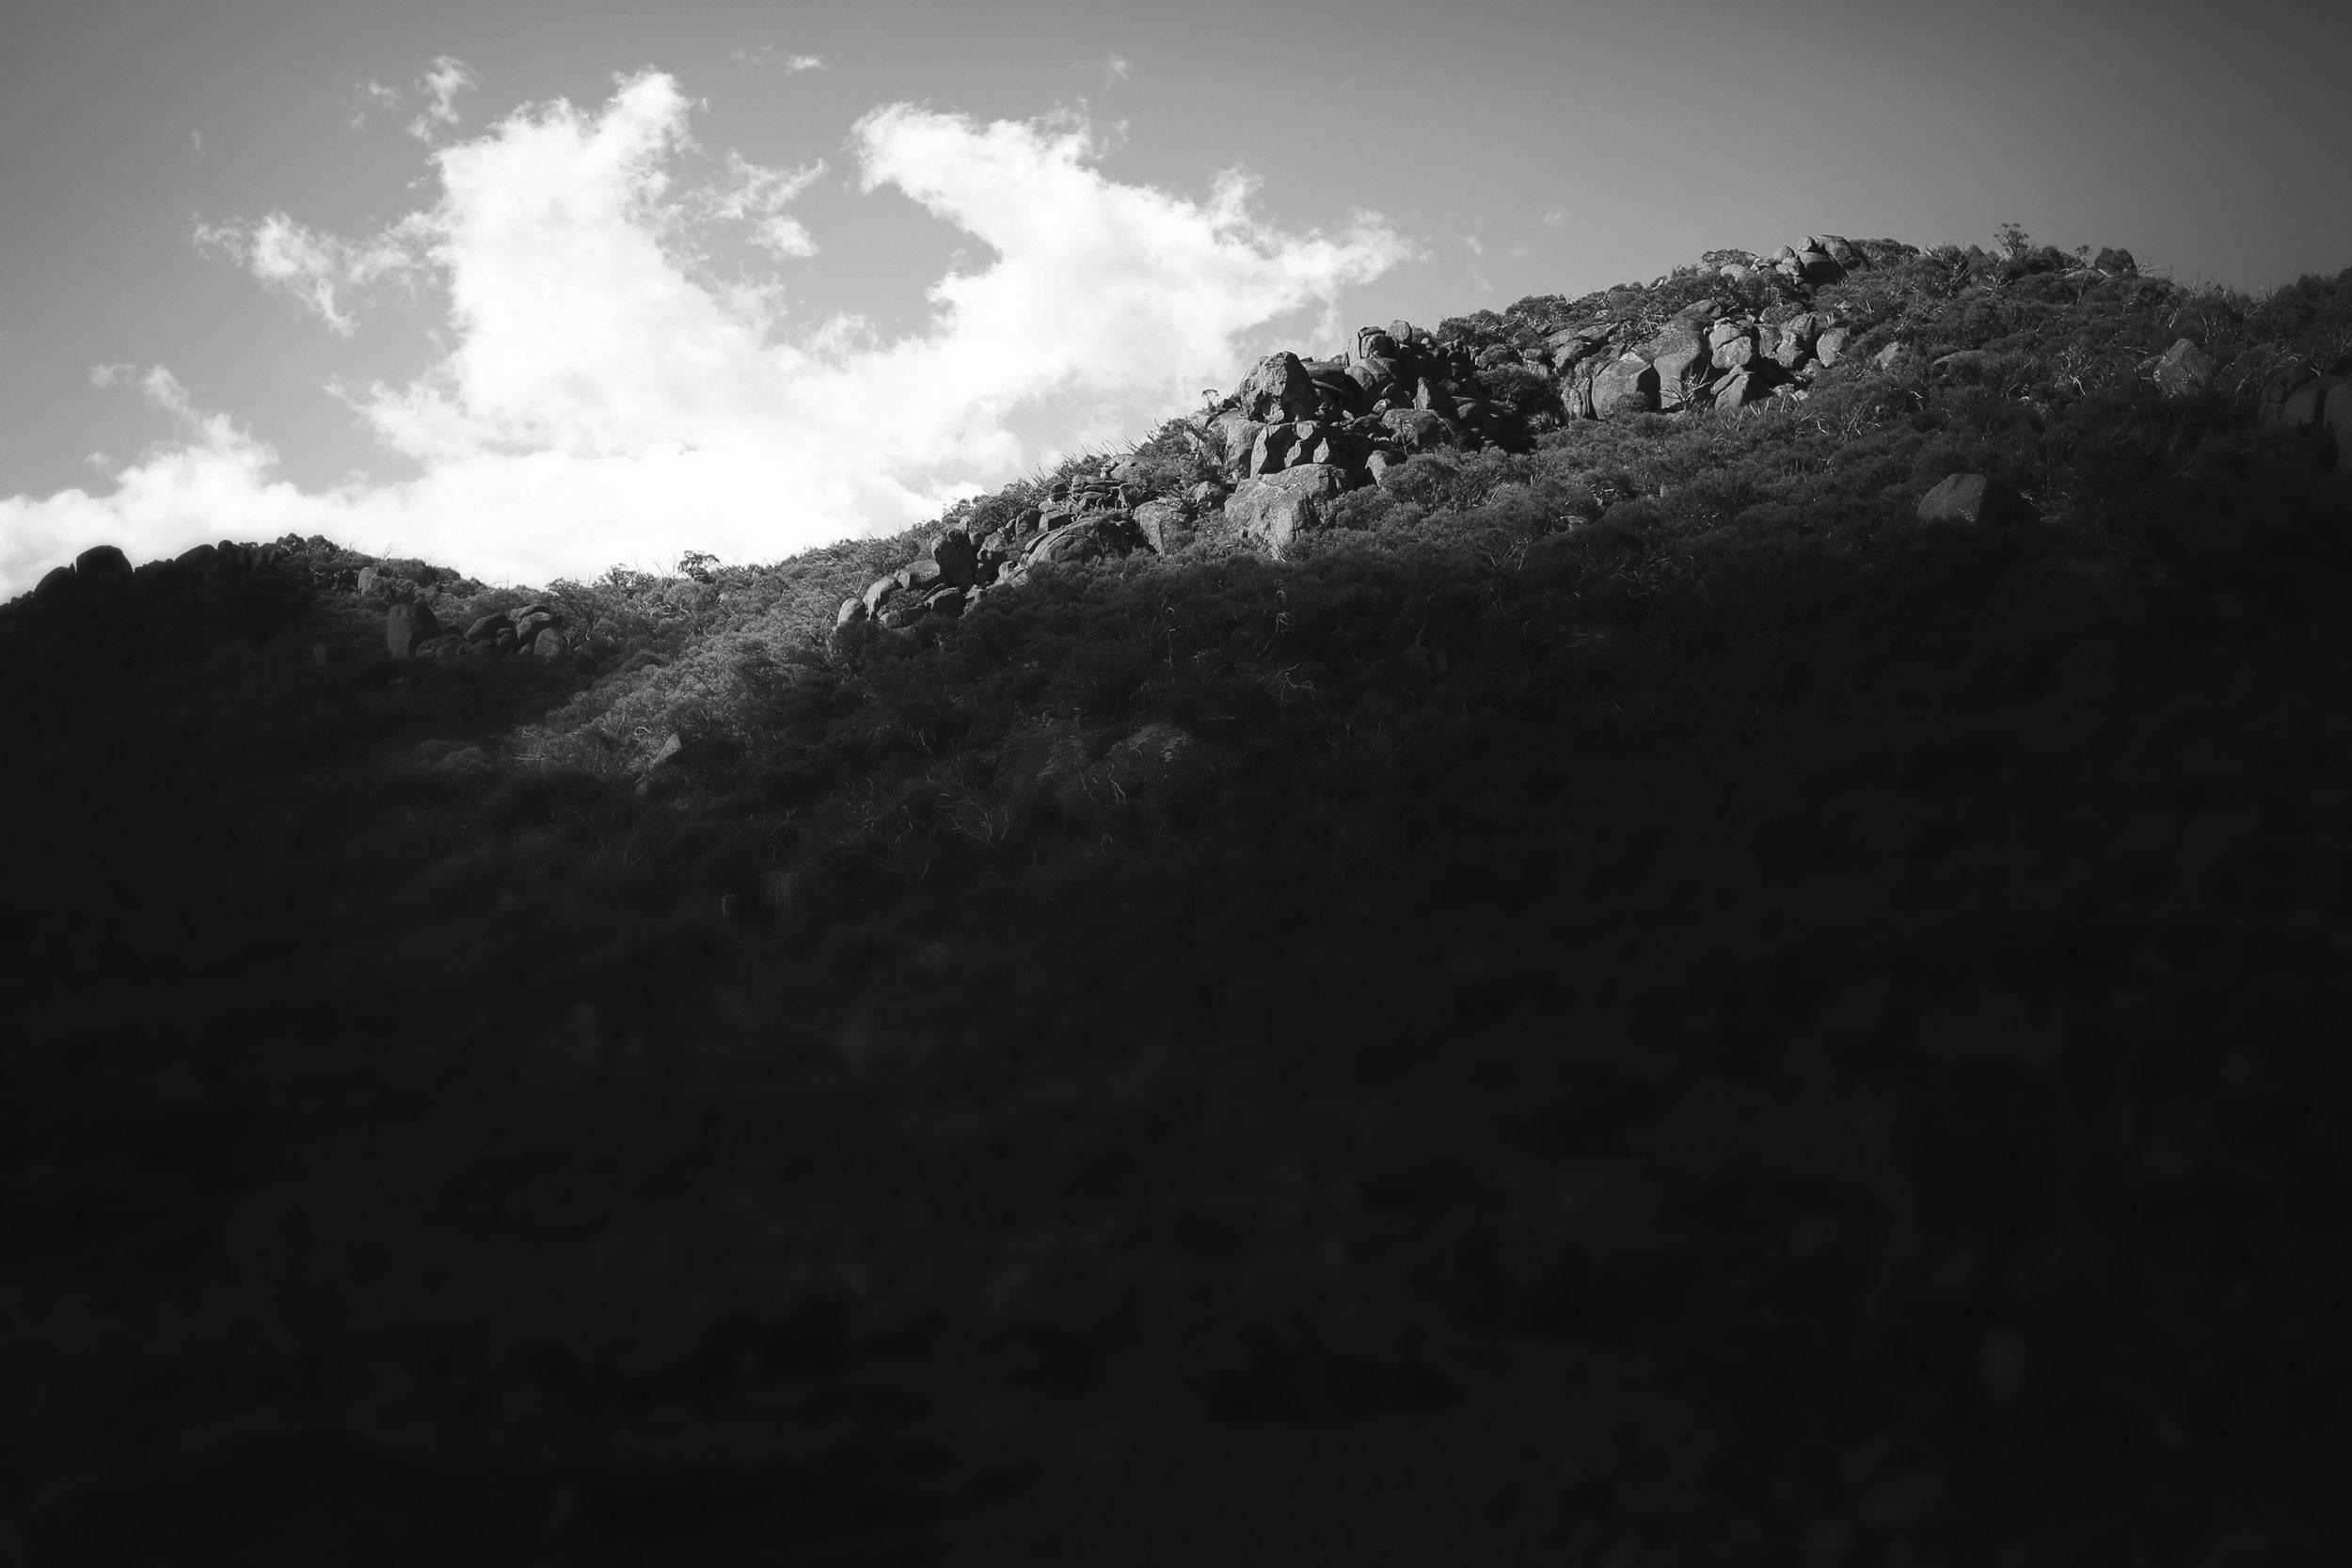 kristin-wursthorn-landscape-photography-art-melbourne-1.jpg